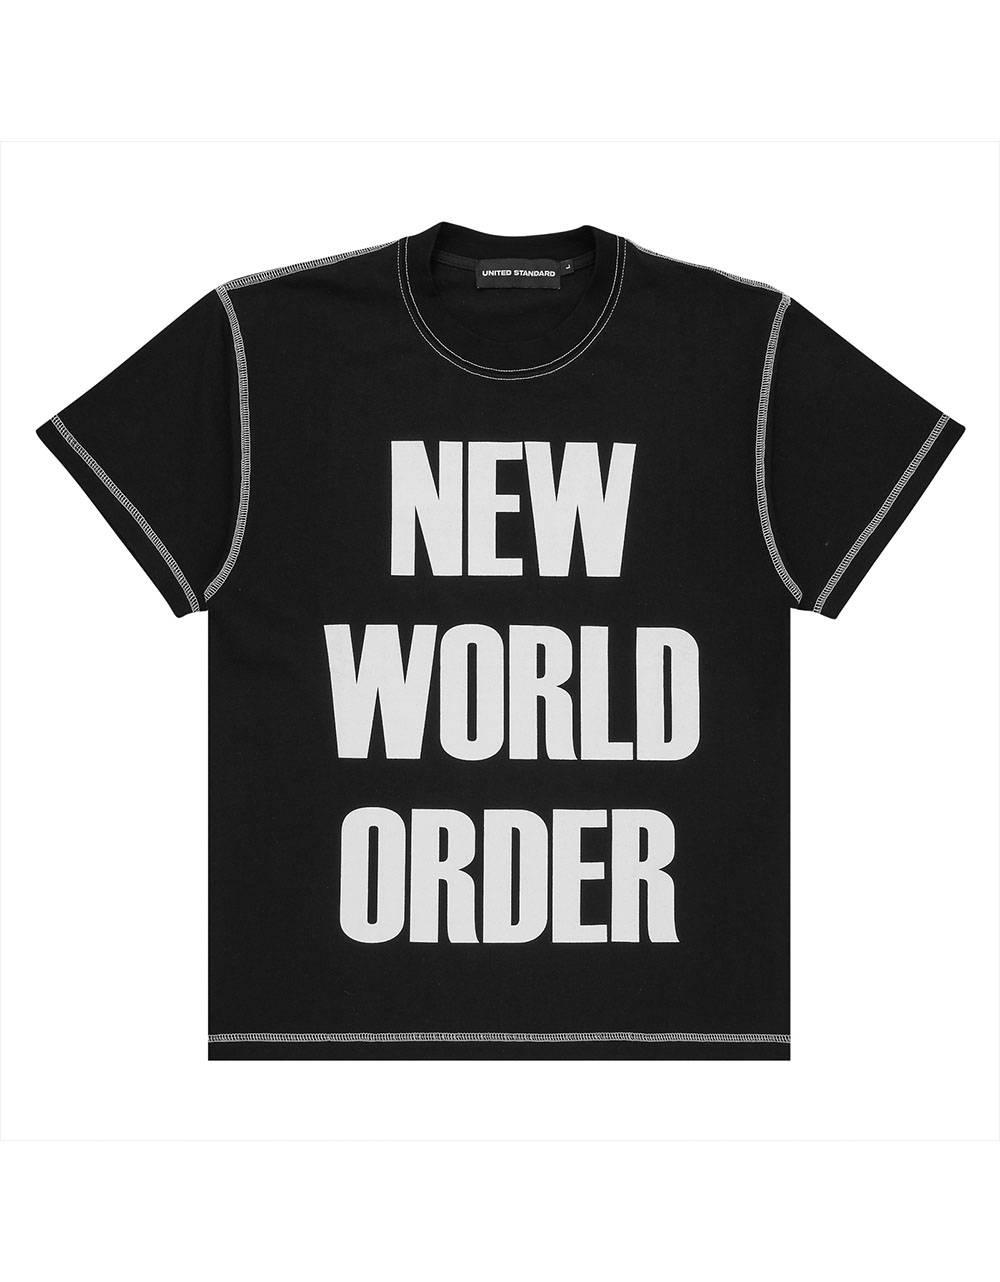 United Standard New world order tee - black United Standard T-shirt 79,00€